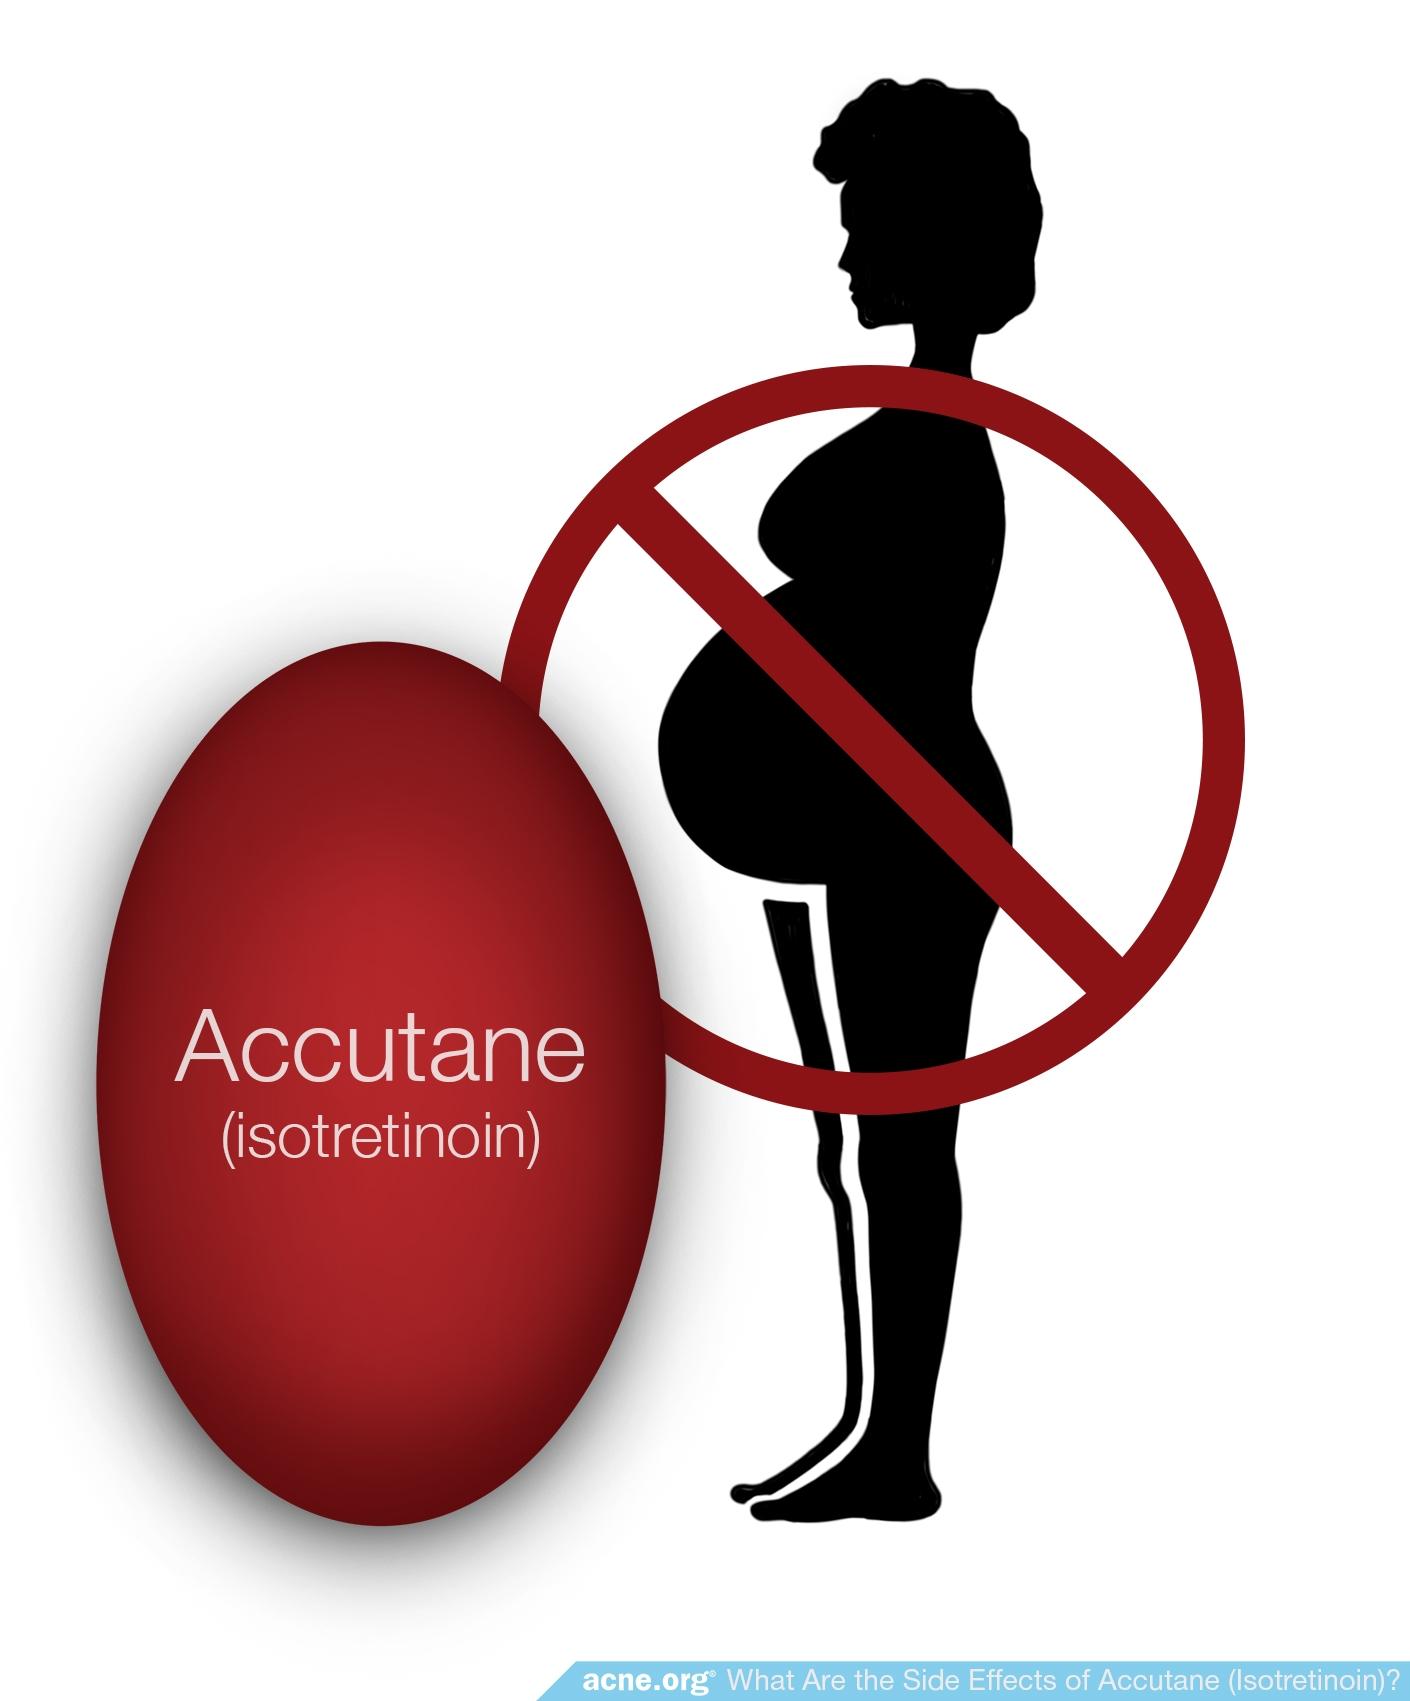 Women Should Not Take Accutane When Pregnant - Acne.org